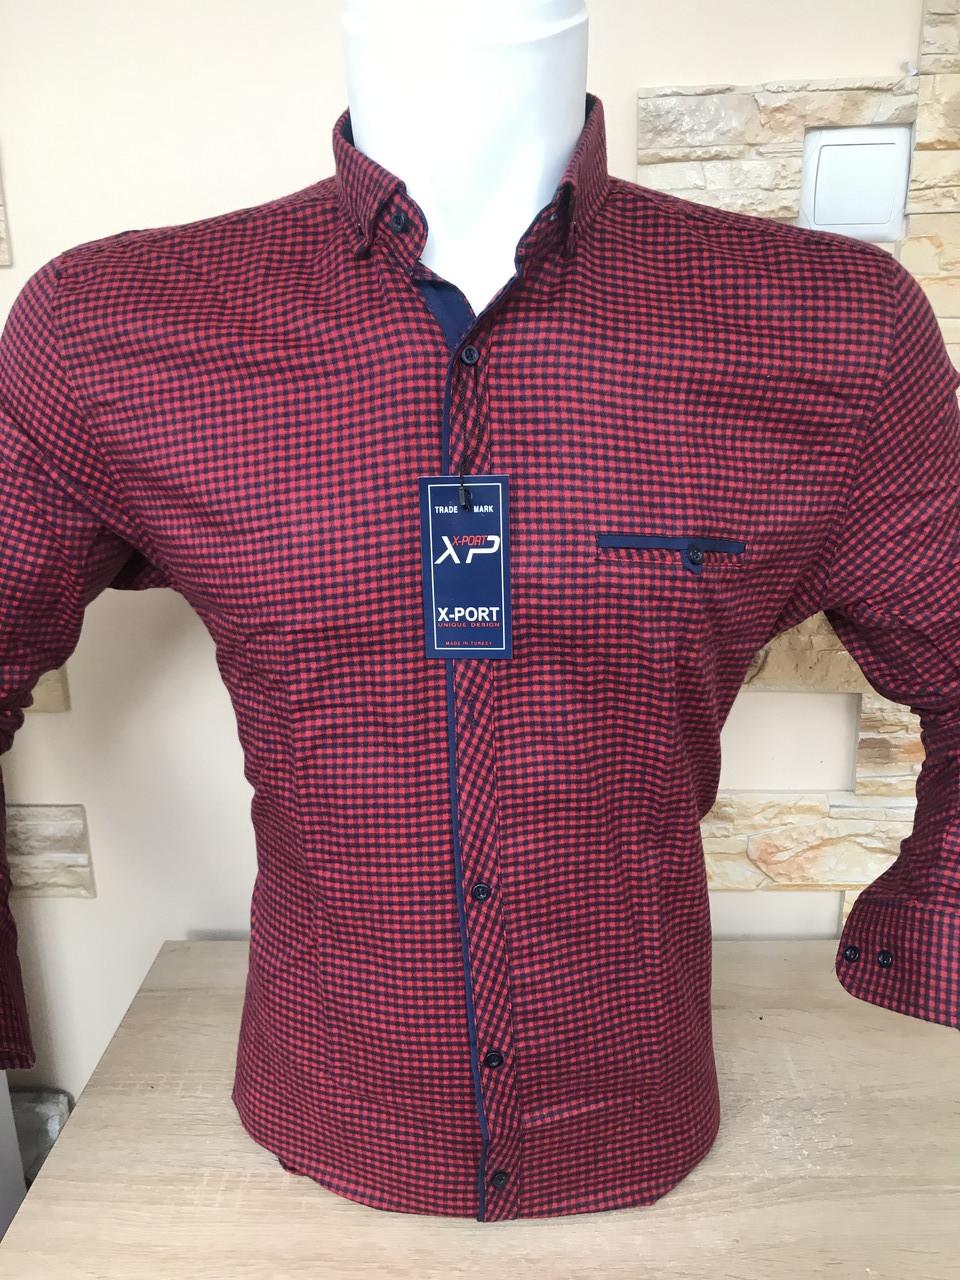 Теплая кашемировая рубашка Х-port